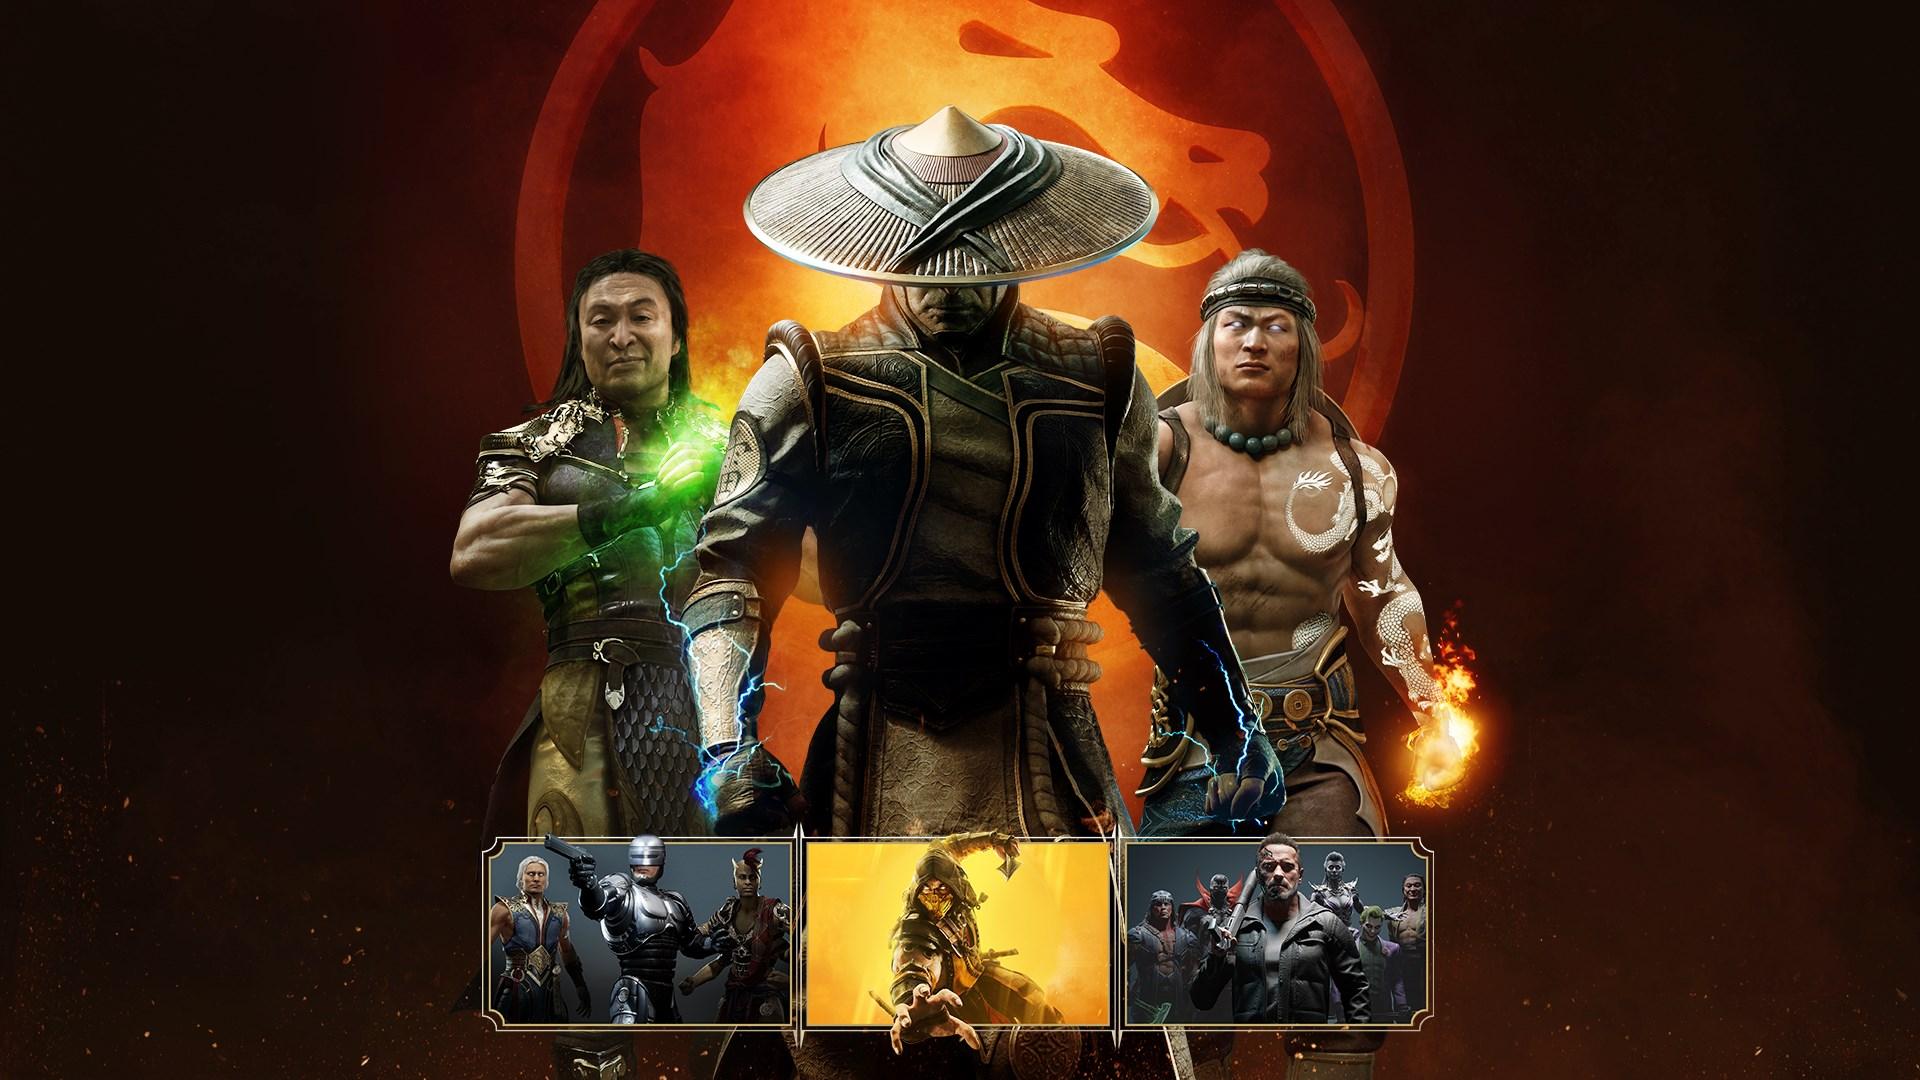 Открылся предзаказ на Mortal Kombat 11: Aftermath